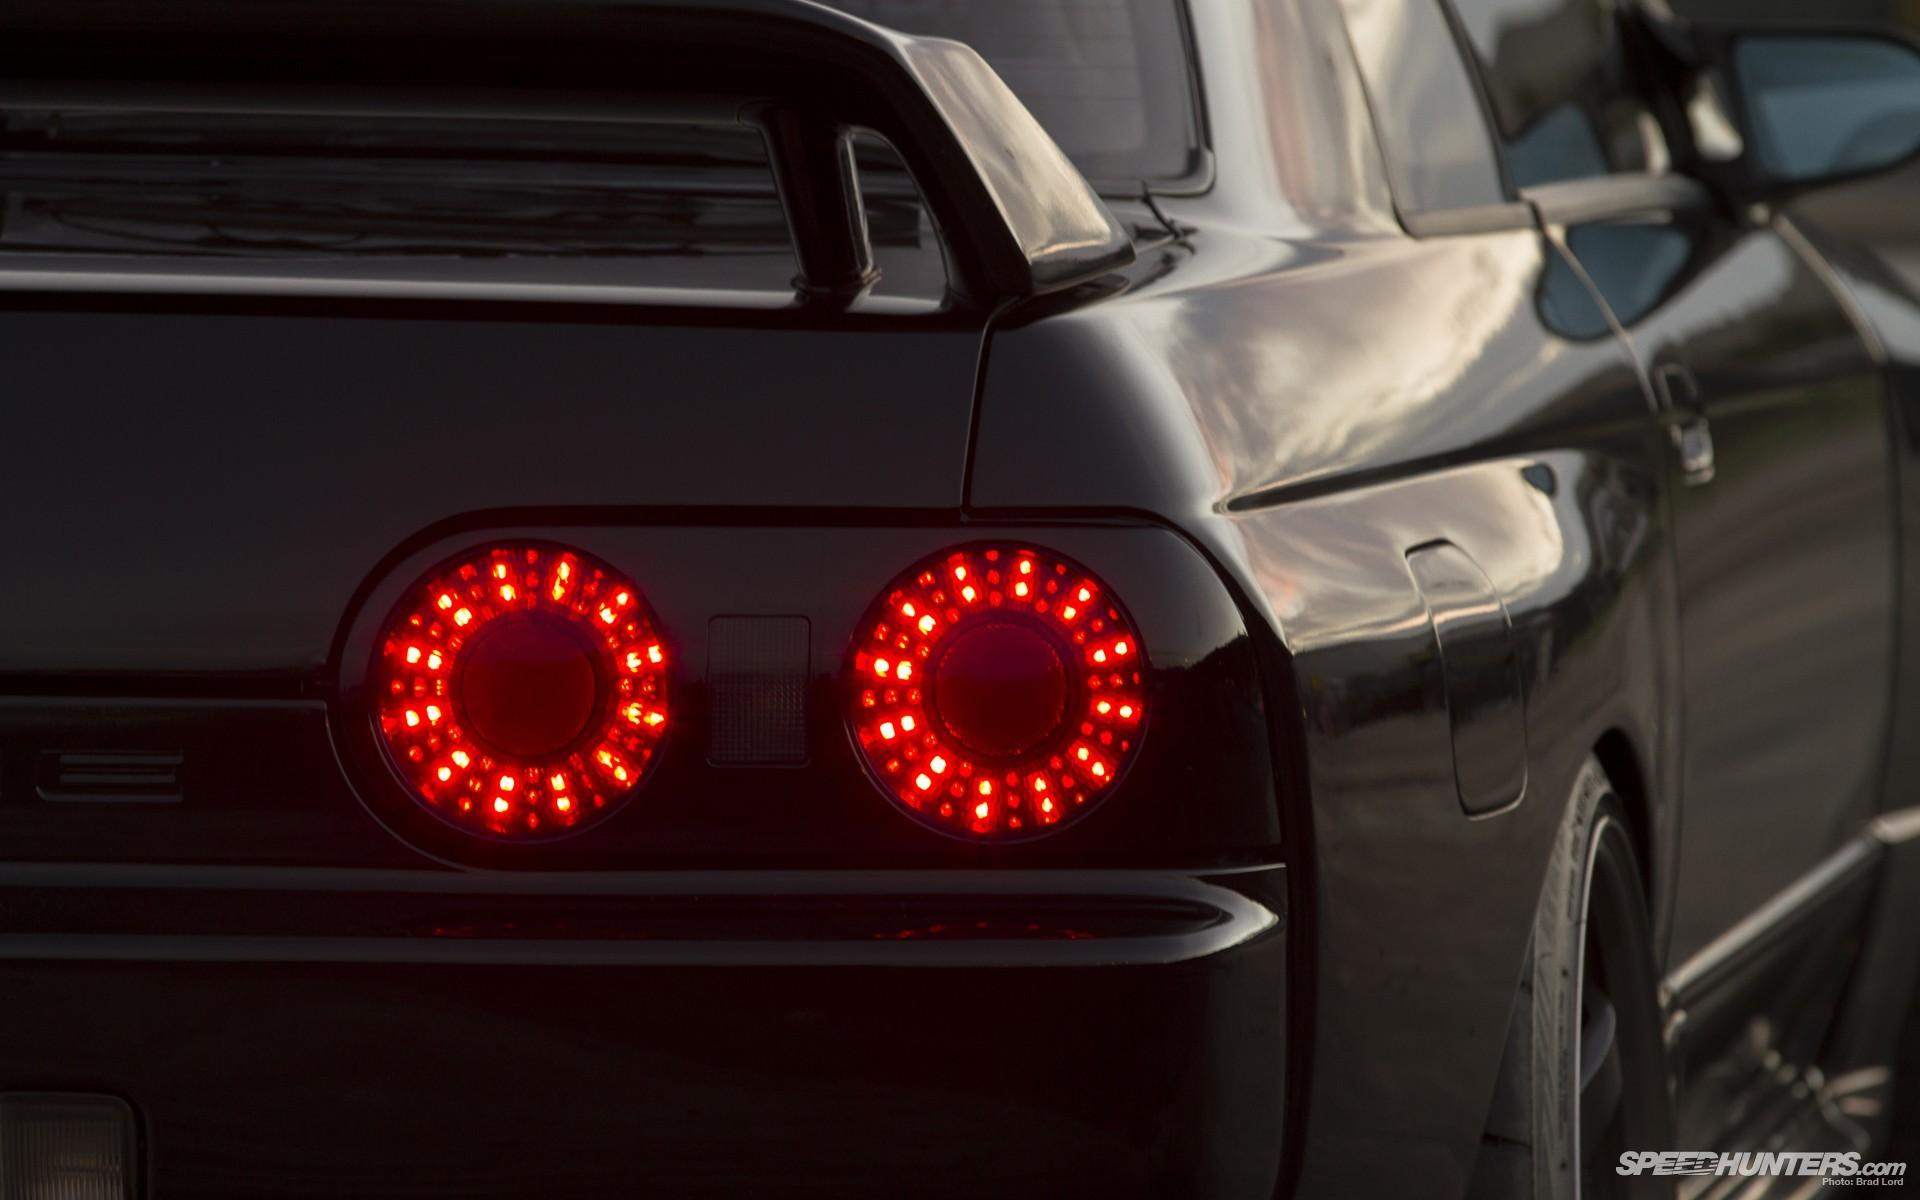 Stanced Drifting Cars Wallpaper 1366x768 Car Speedhunters Nissan Skyline R32 Wallpapers Hd